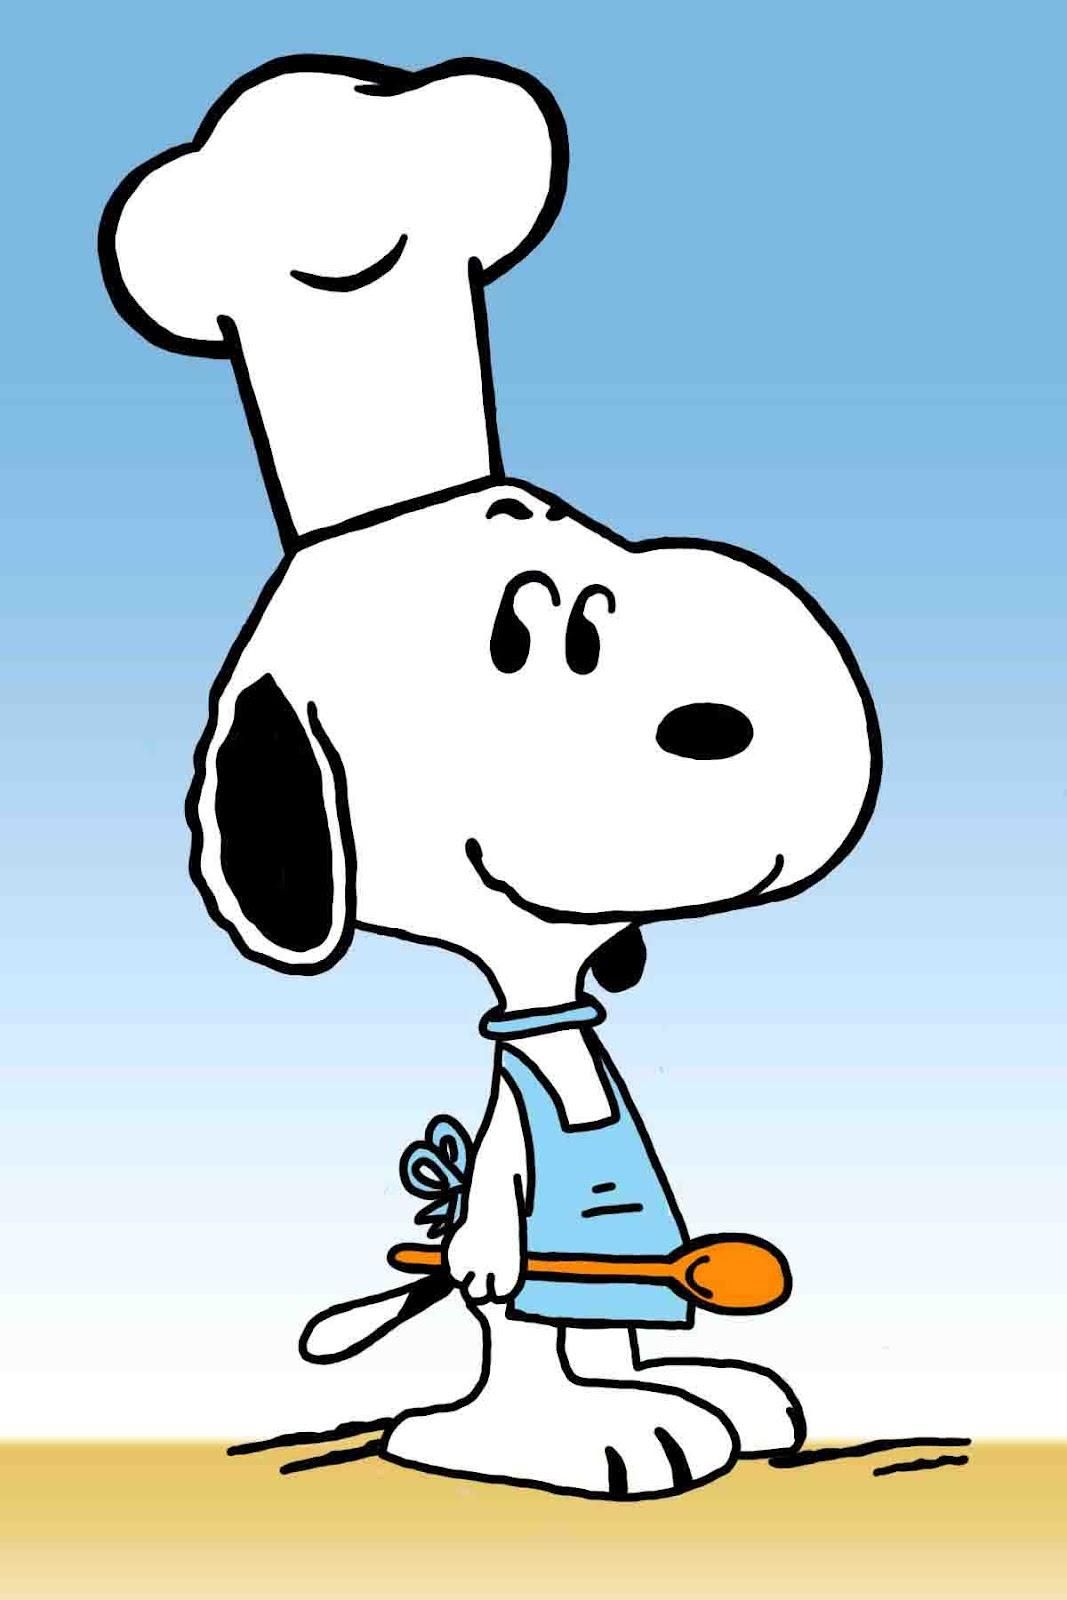 1067x1600 Pin By Linda Casady Hubbard On Snoopy Snoopy